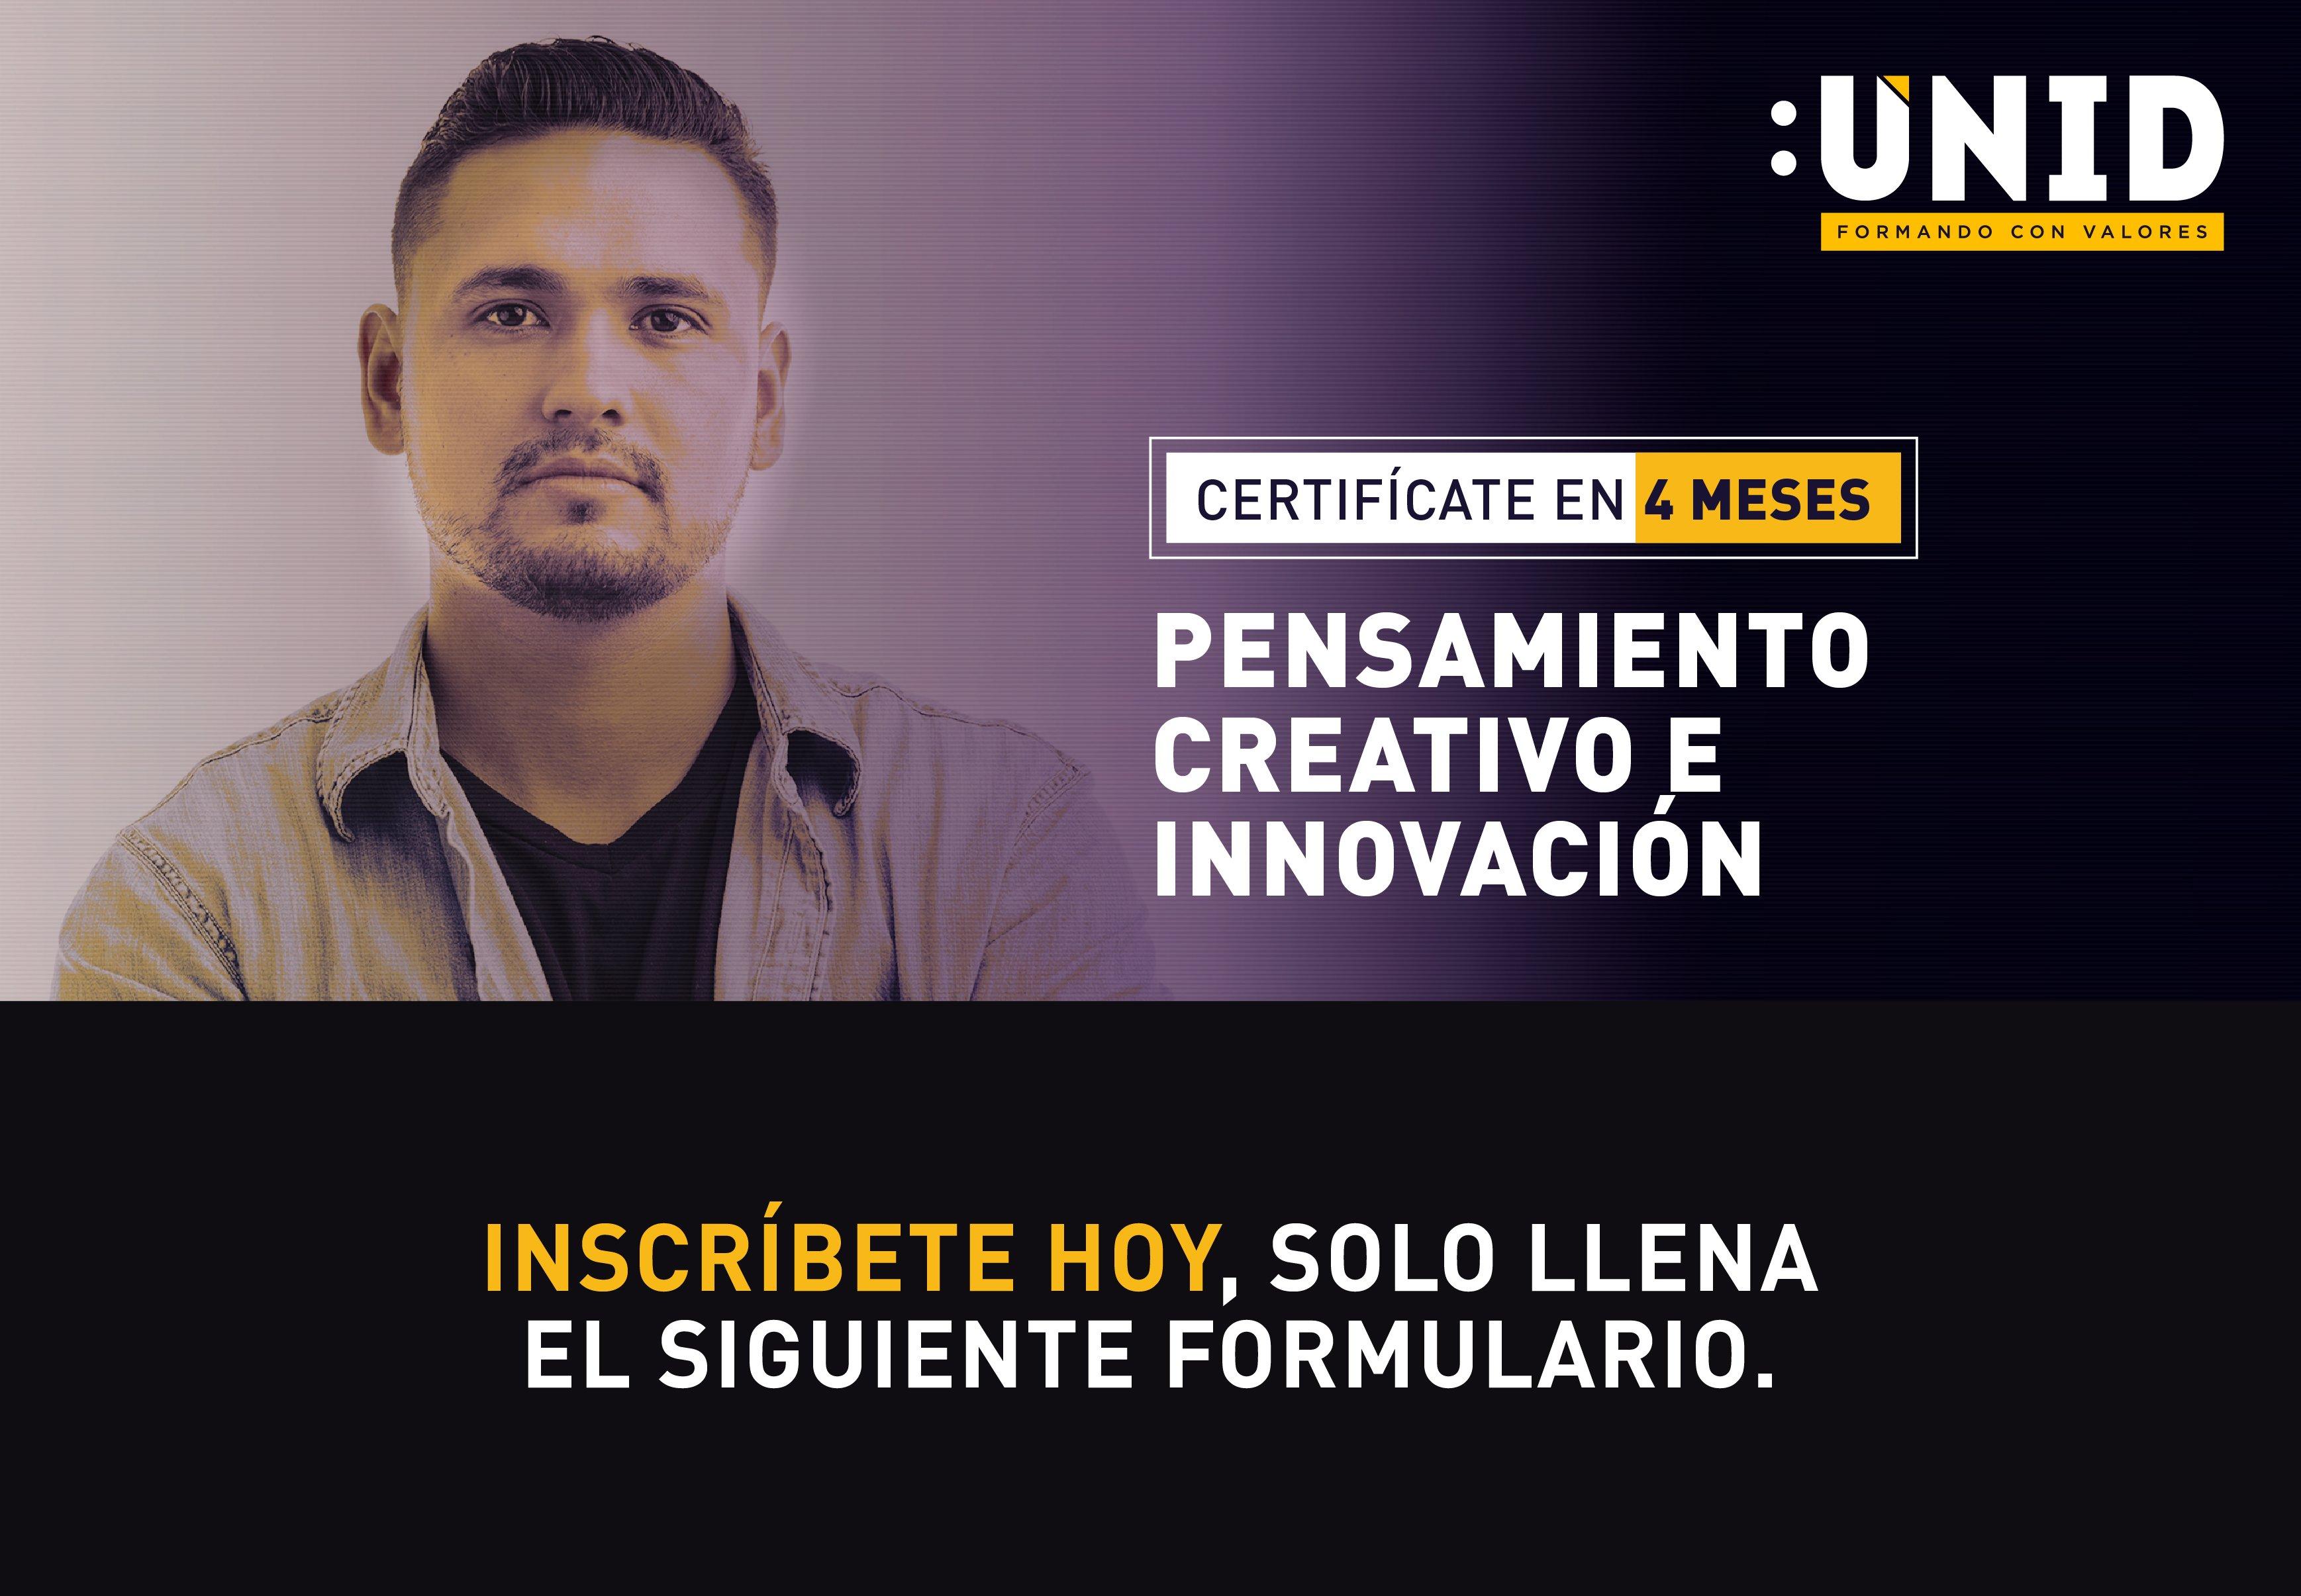 UNID LP Innovacion C_LANDING 1